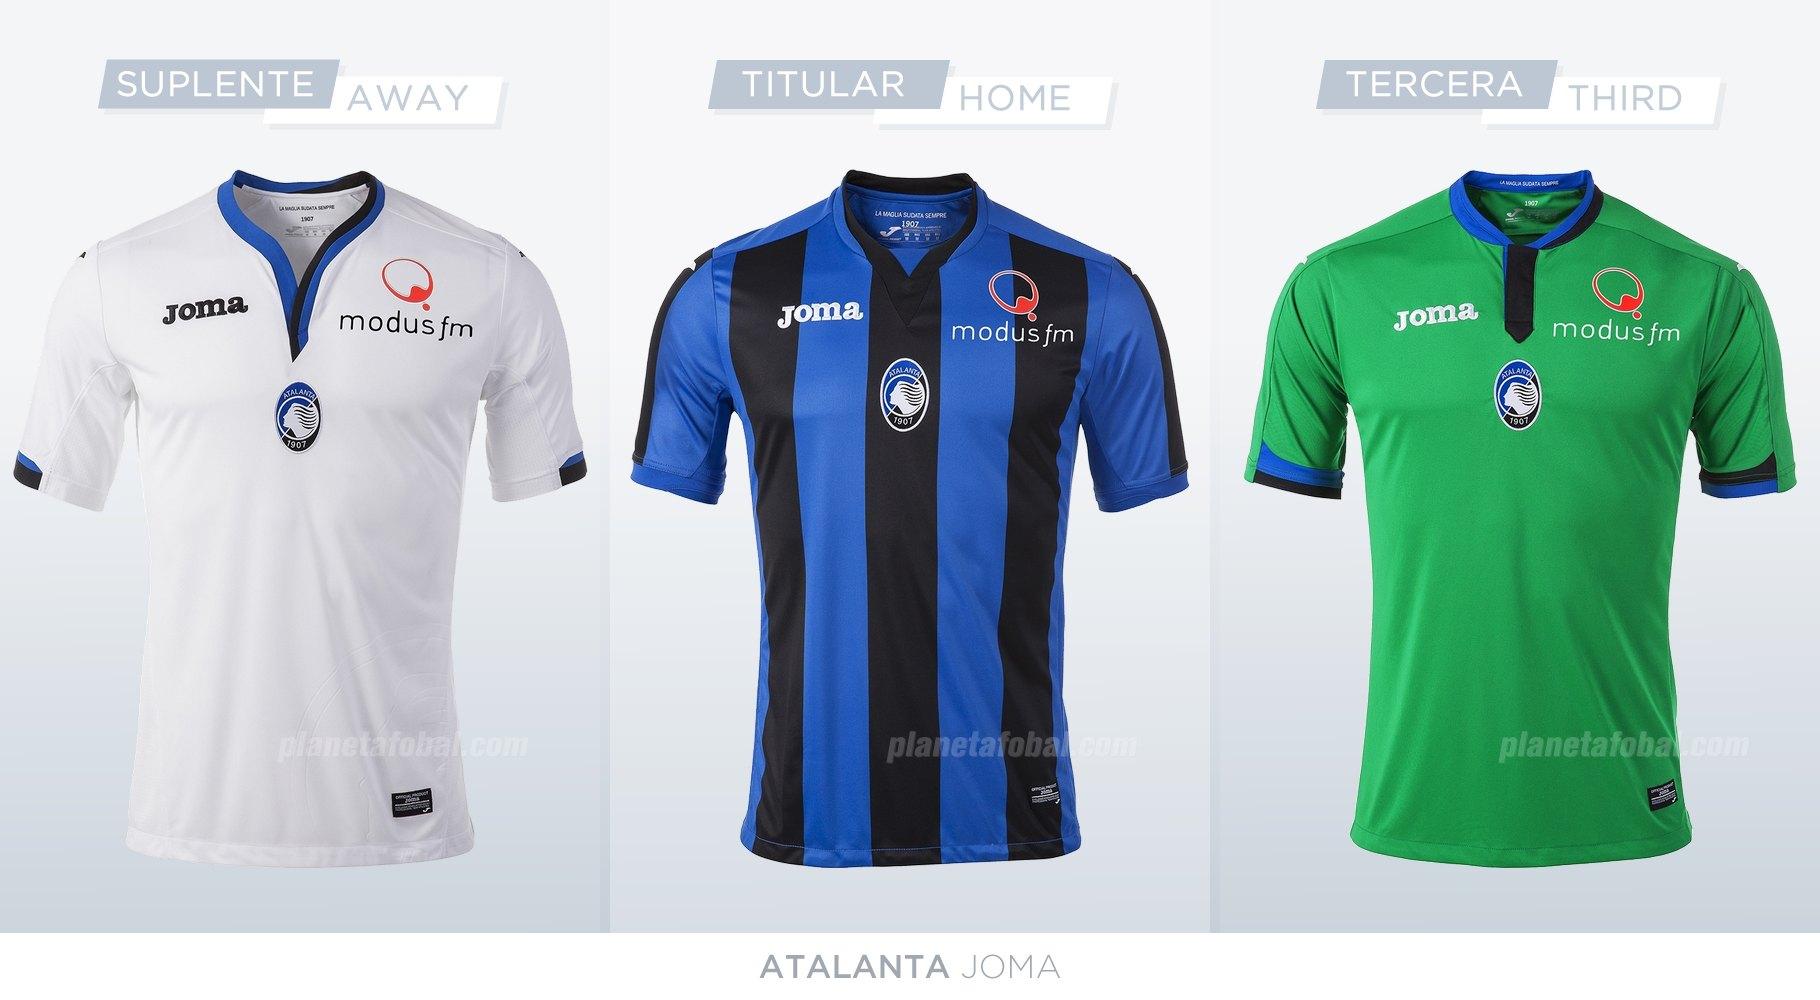 cae227cbd3bd5 Camisetas de la Serie A 2017 18